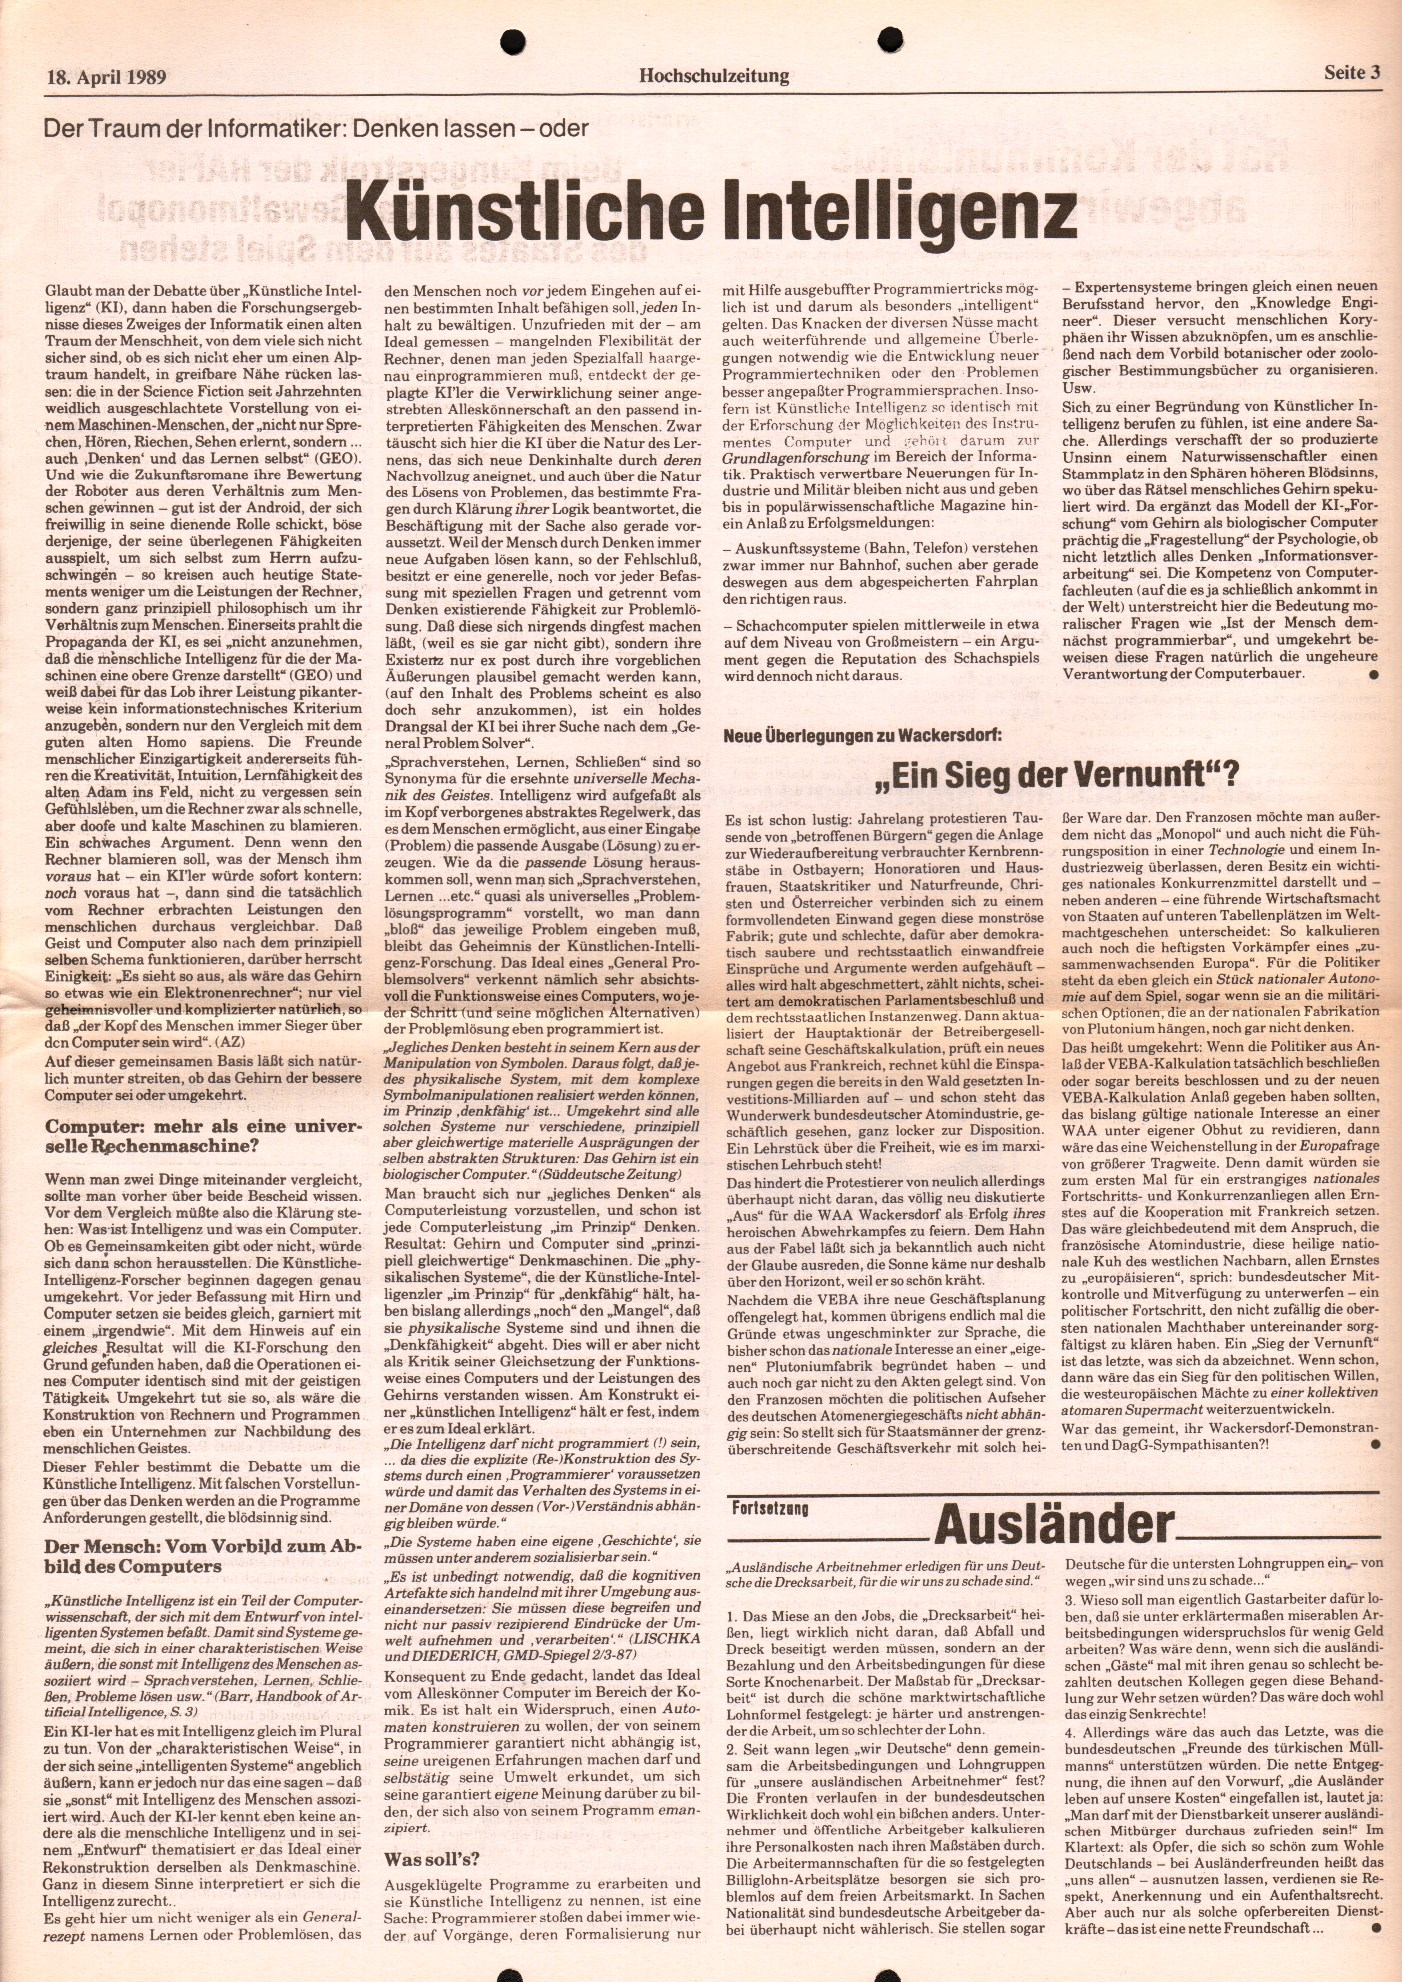 Stuttgart_MG_Hochschulzeitung_1989_04_03